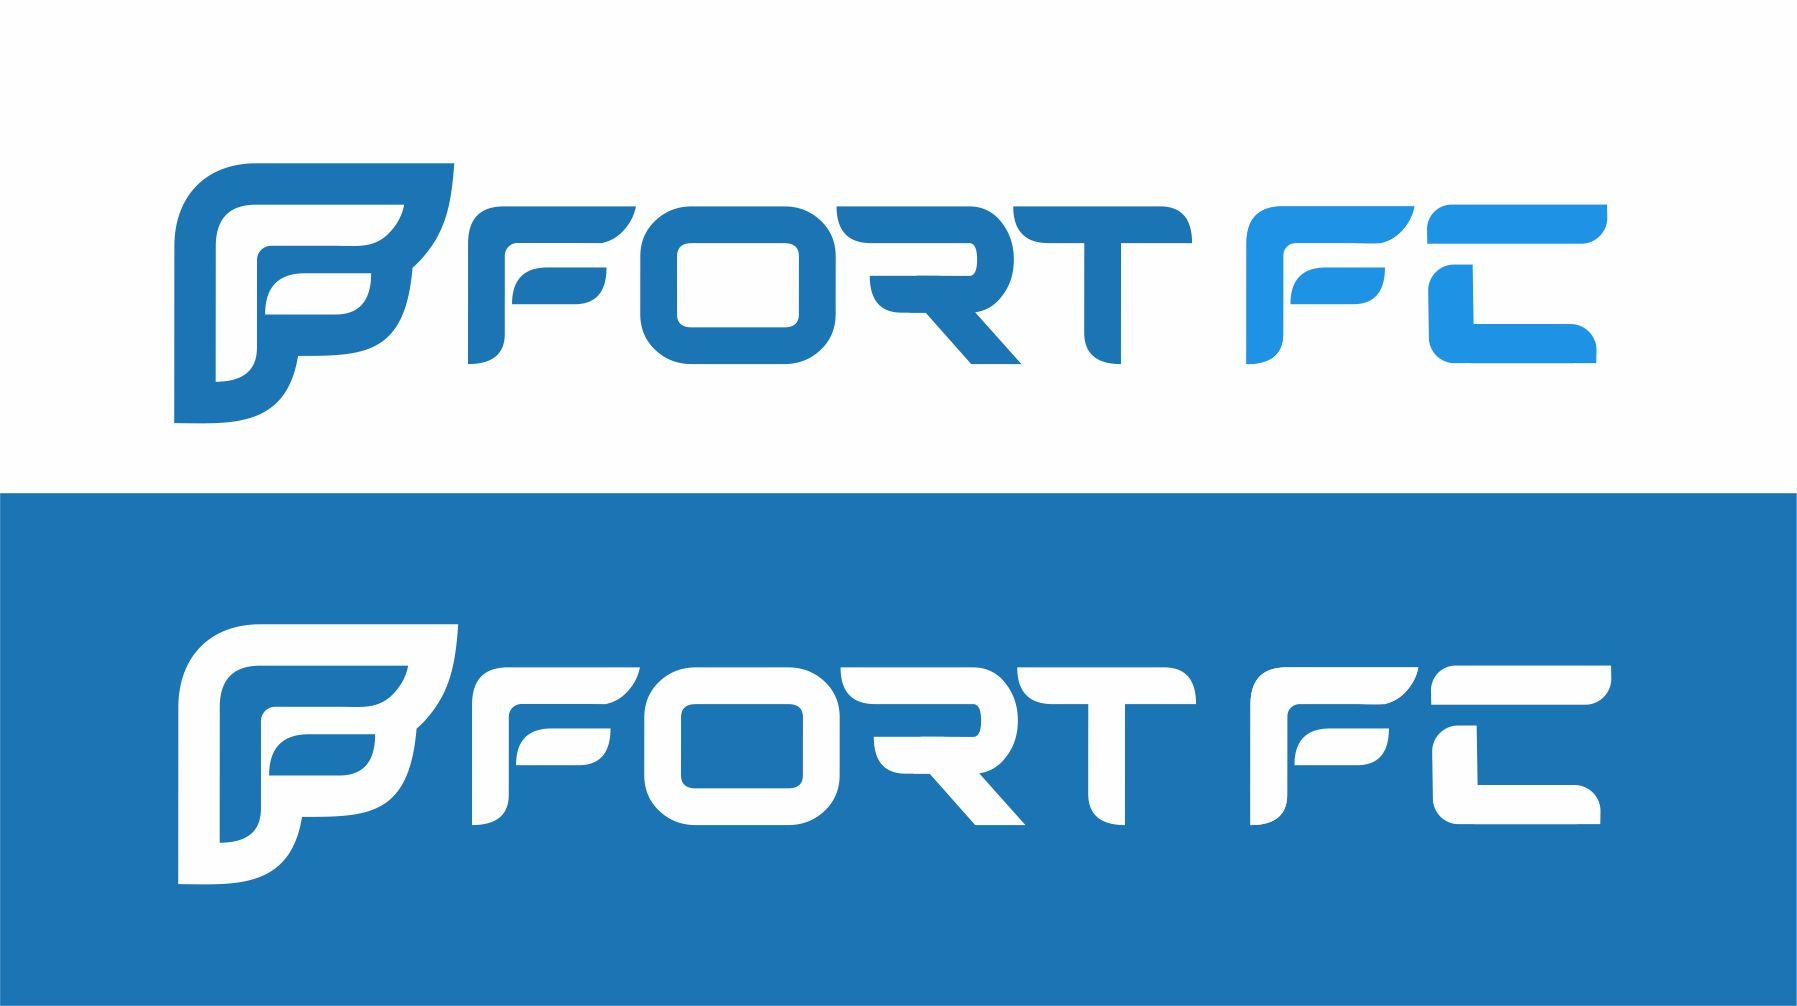 Разработка логотипа финансовой компании фото f_0295a8483a178e89.jpg